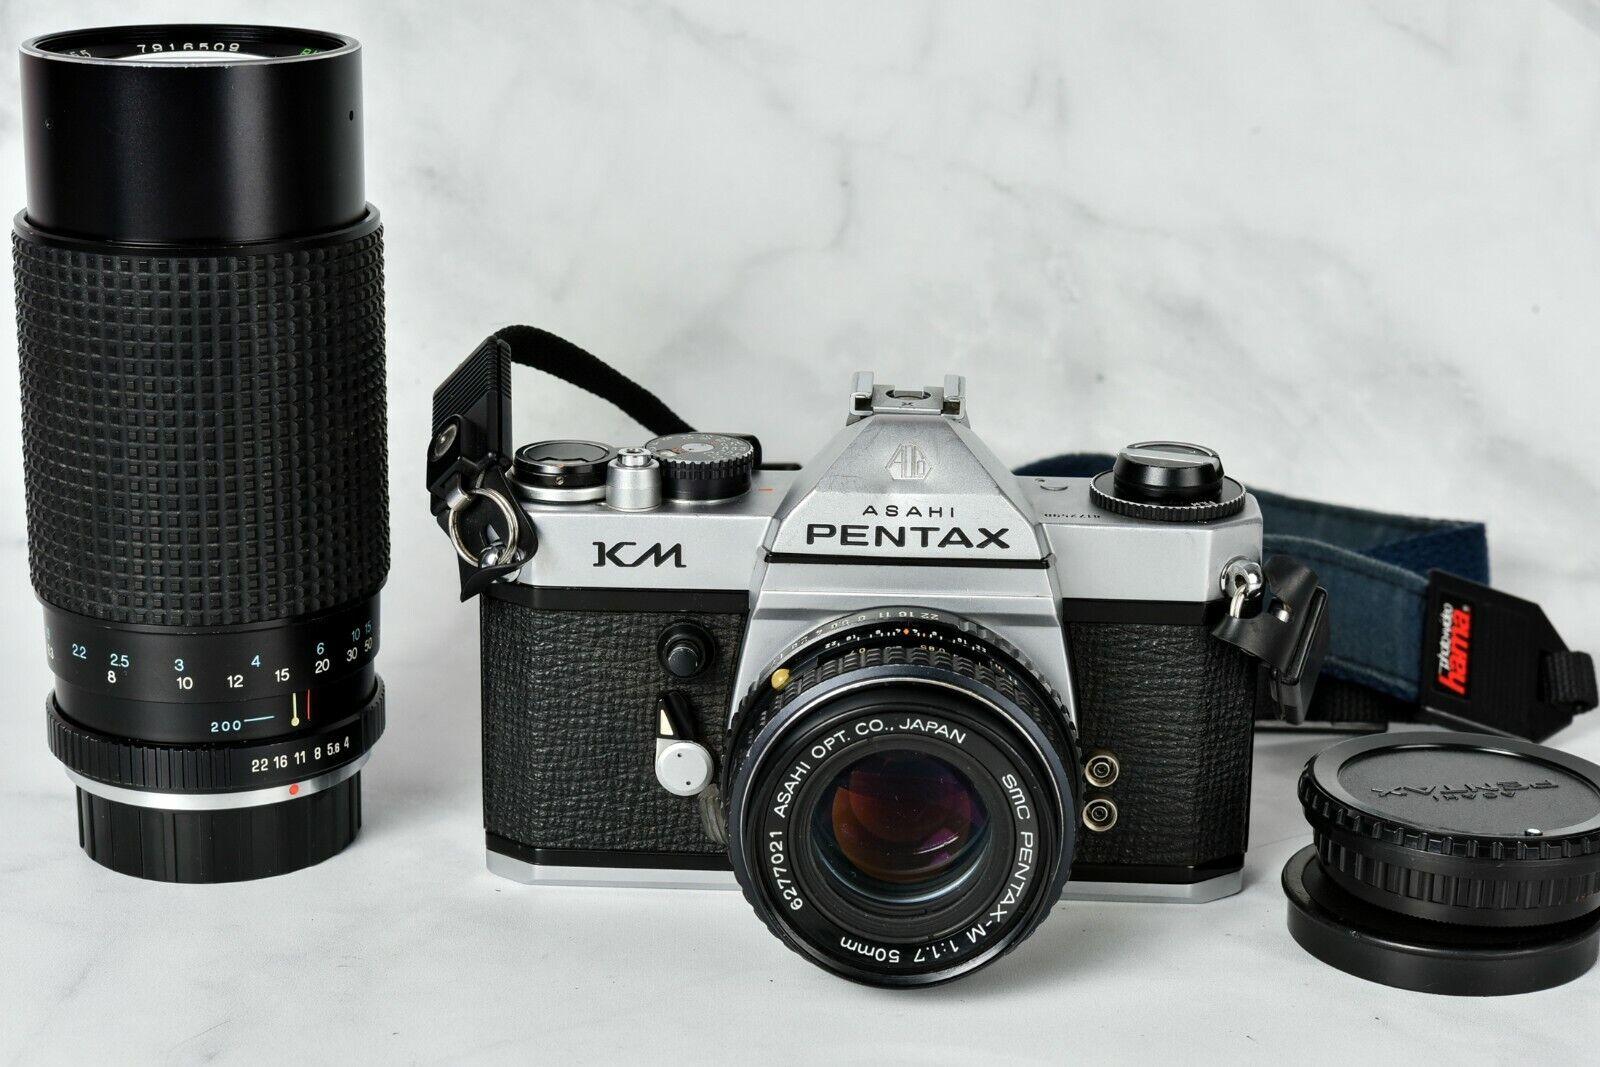 Pentax KM SLR camera + Pentax-M 50mm 1.7 and RMC Tokina 80-200mm lenses